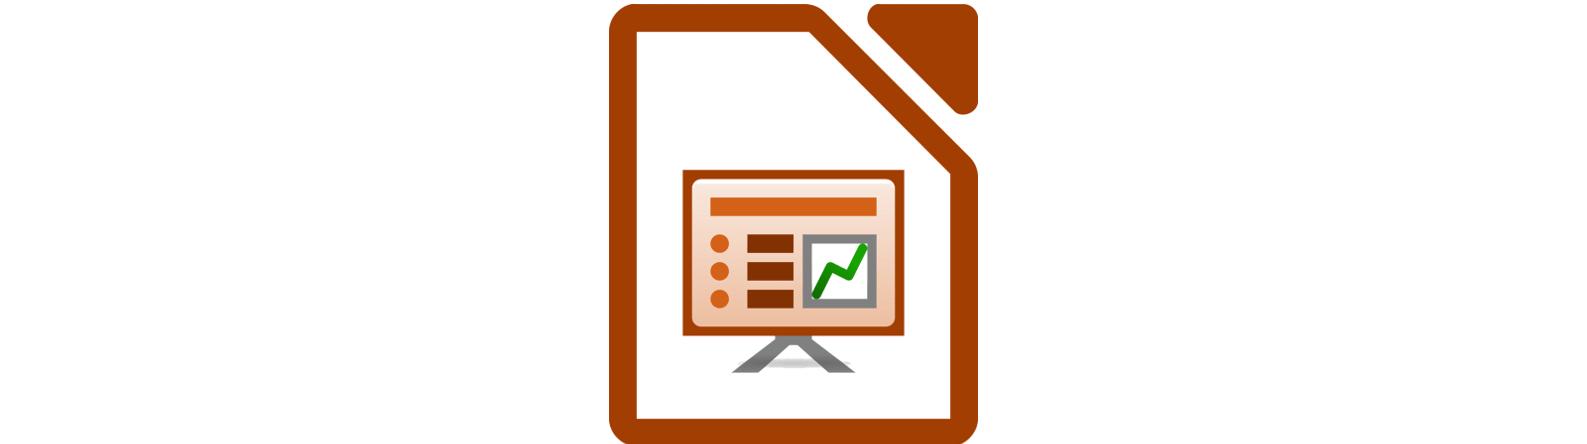 Logo for Libre Office Impress